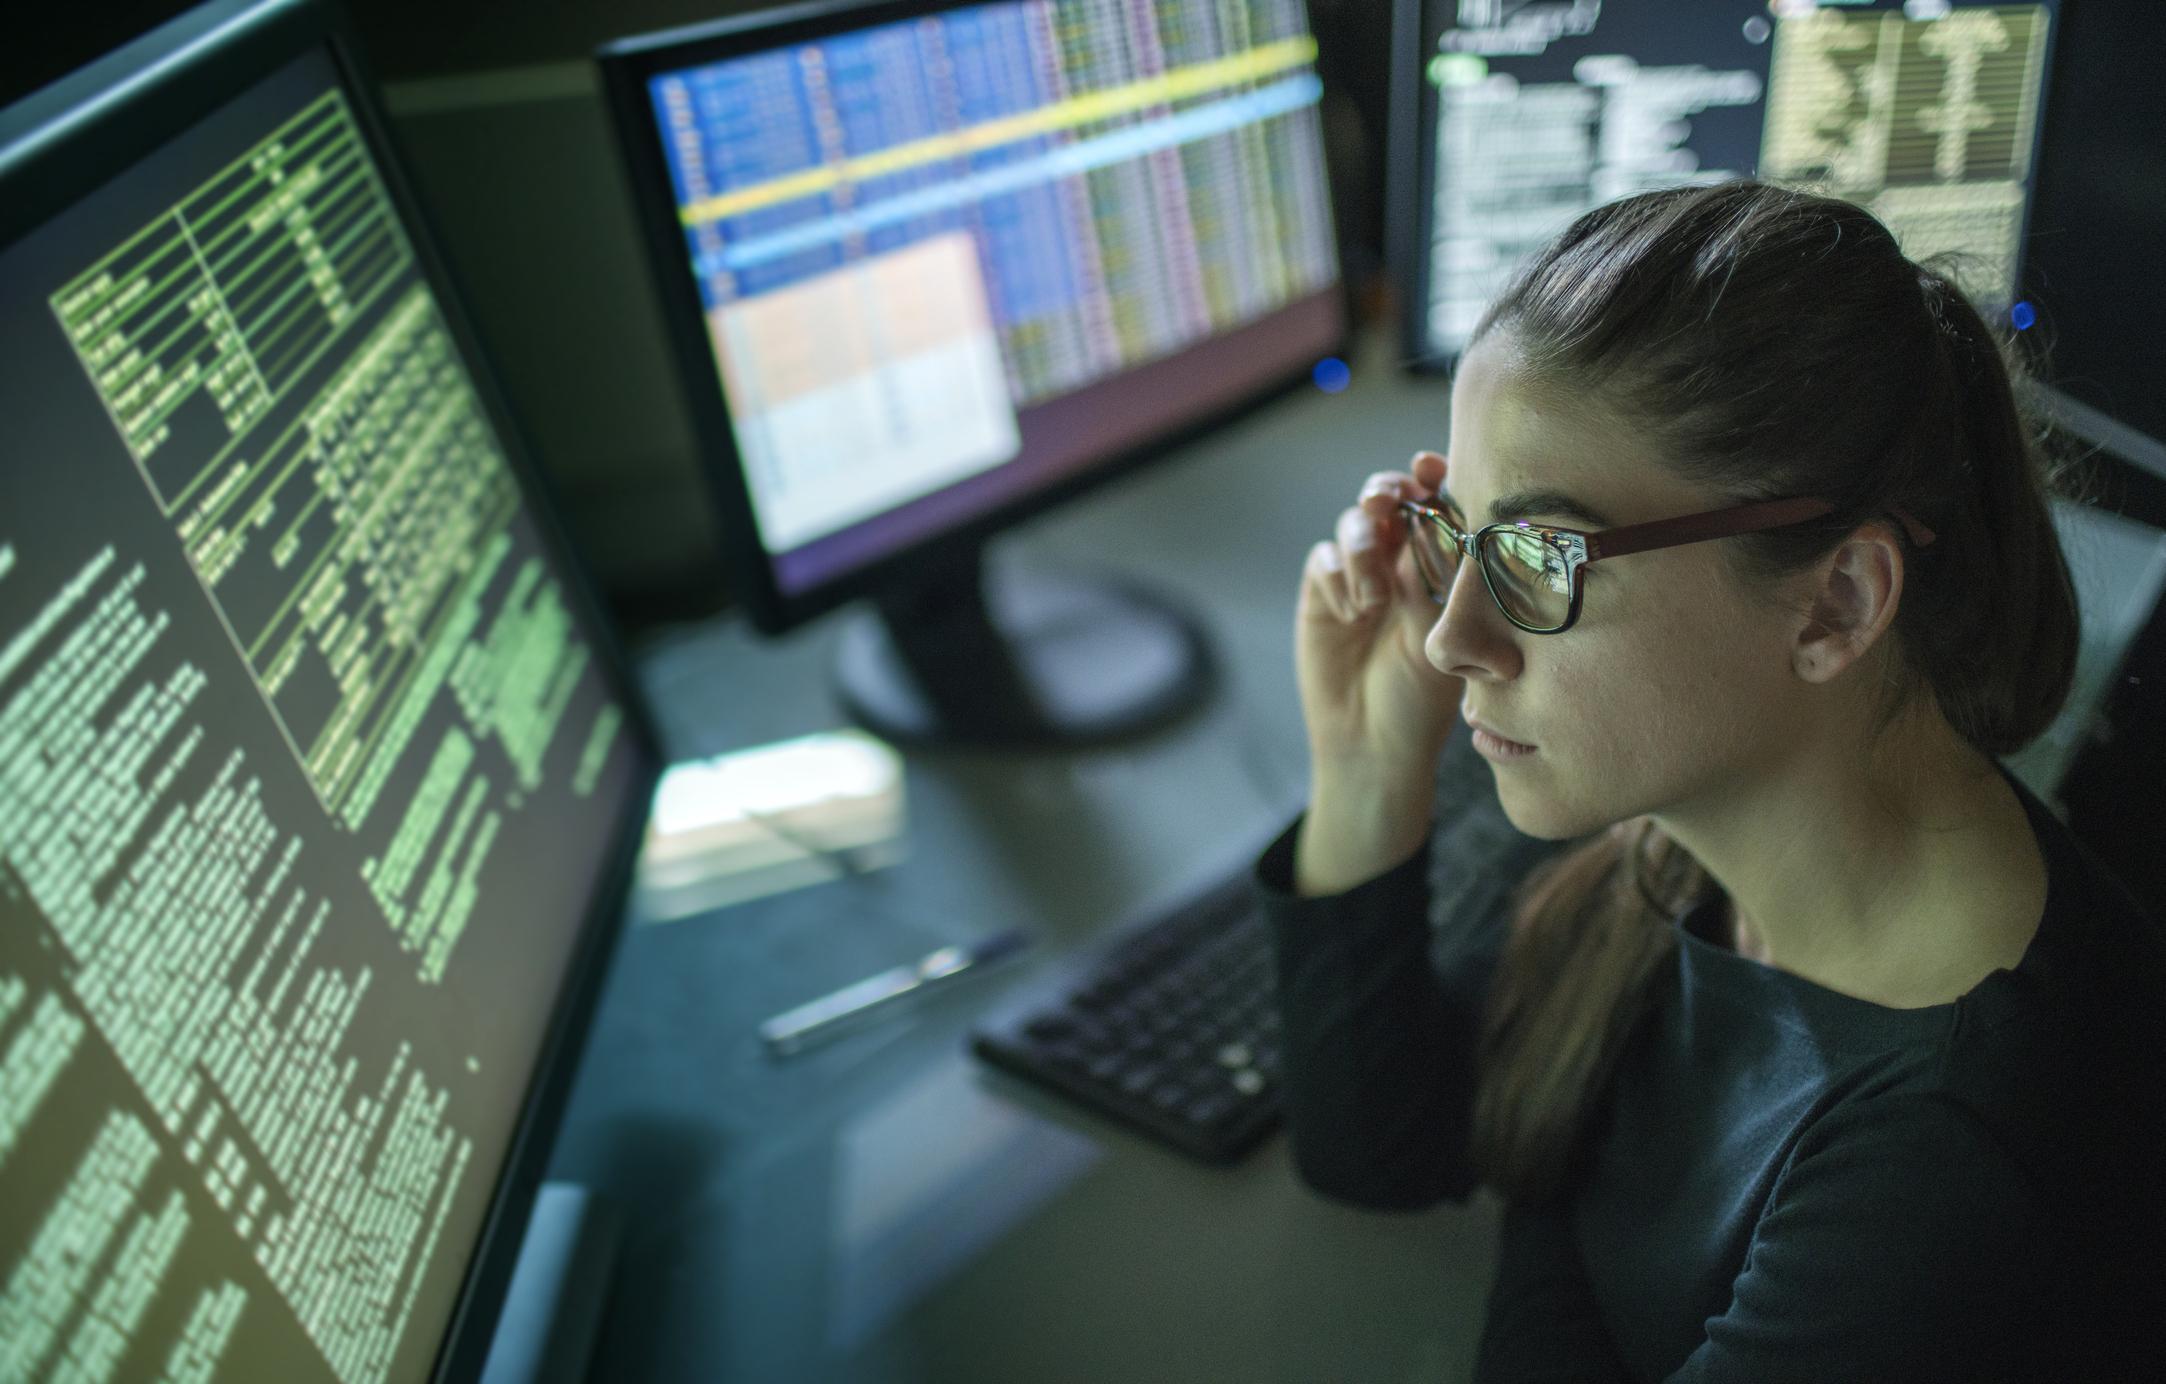 cyber-security-digital-security